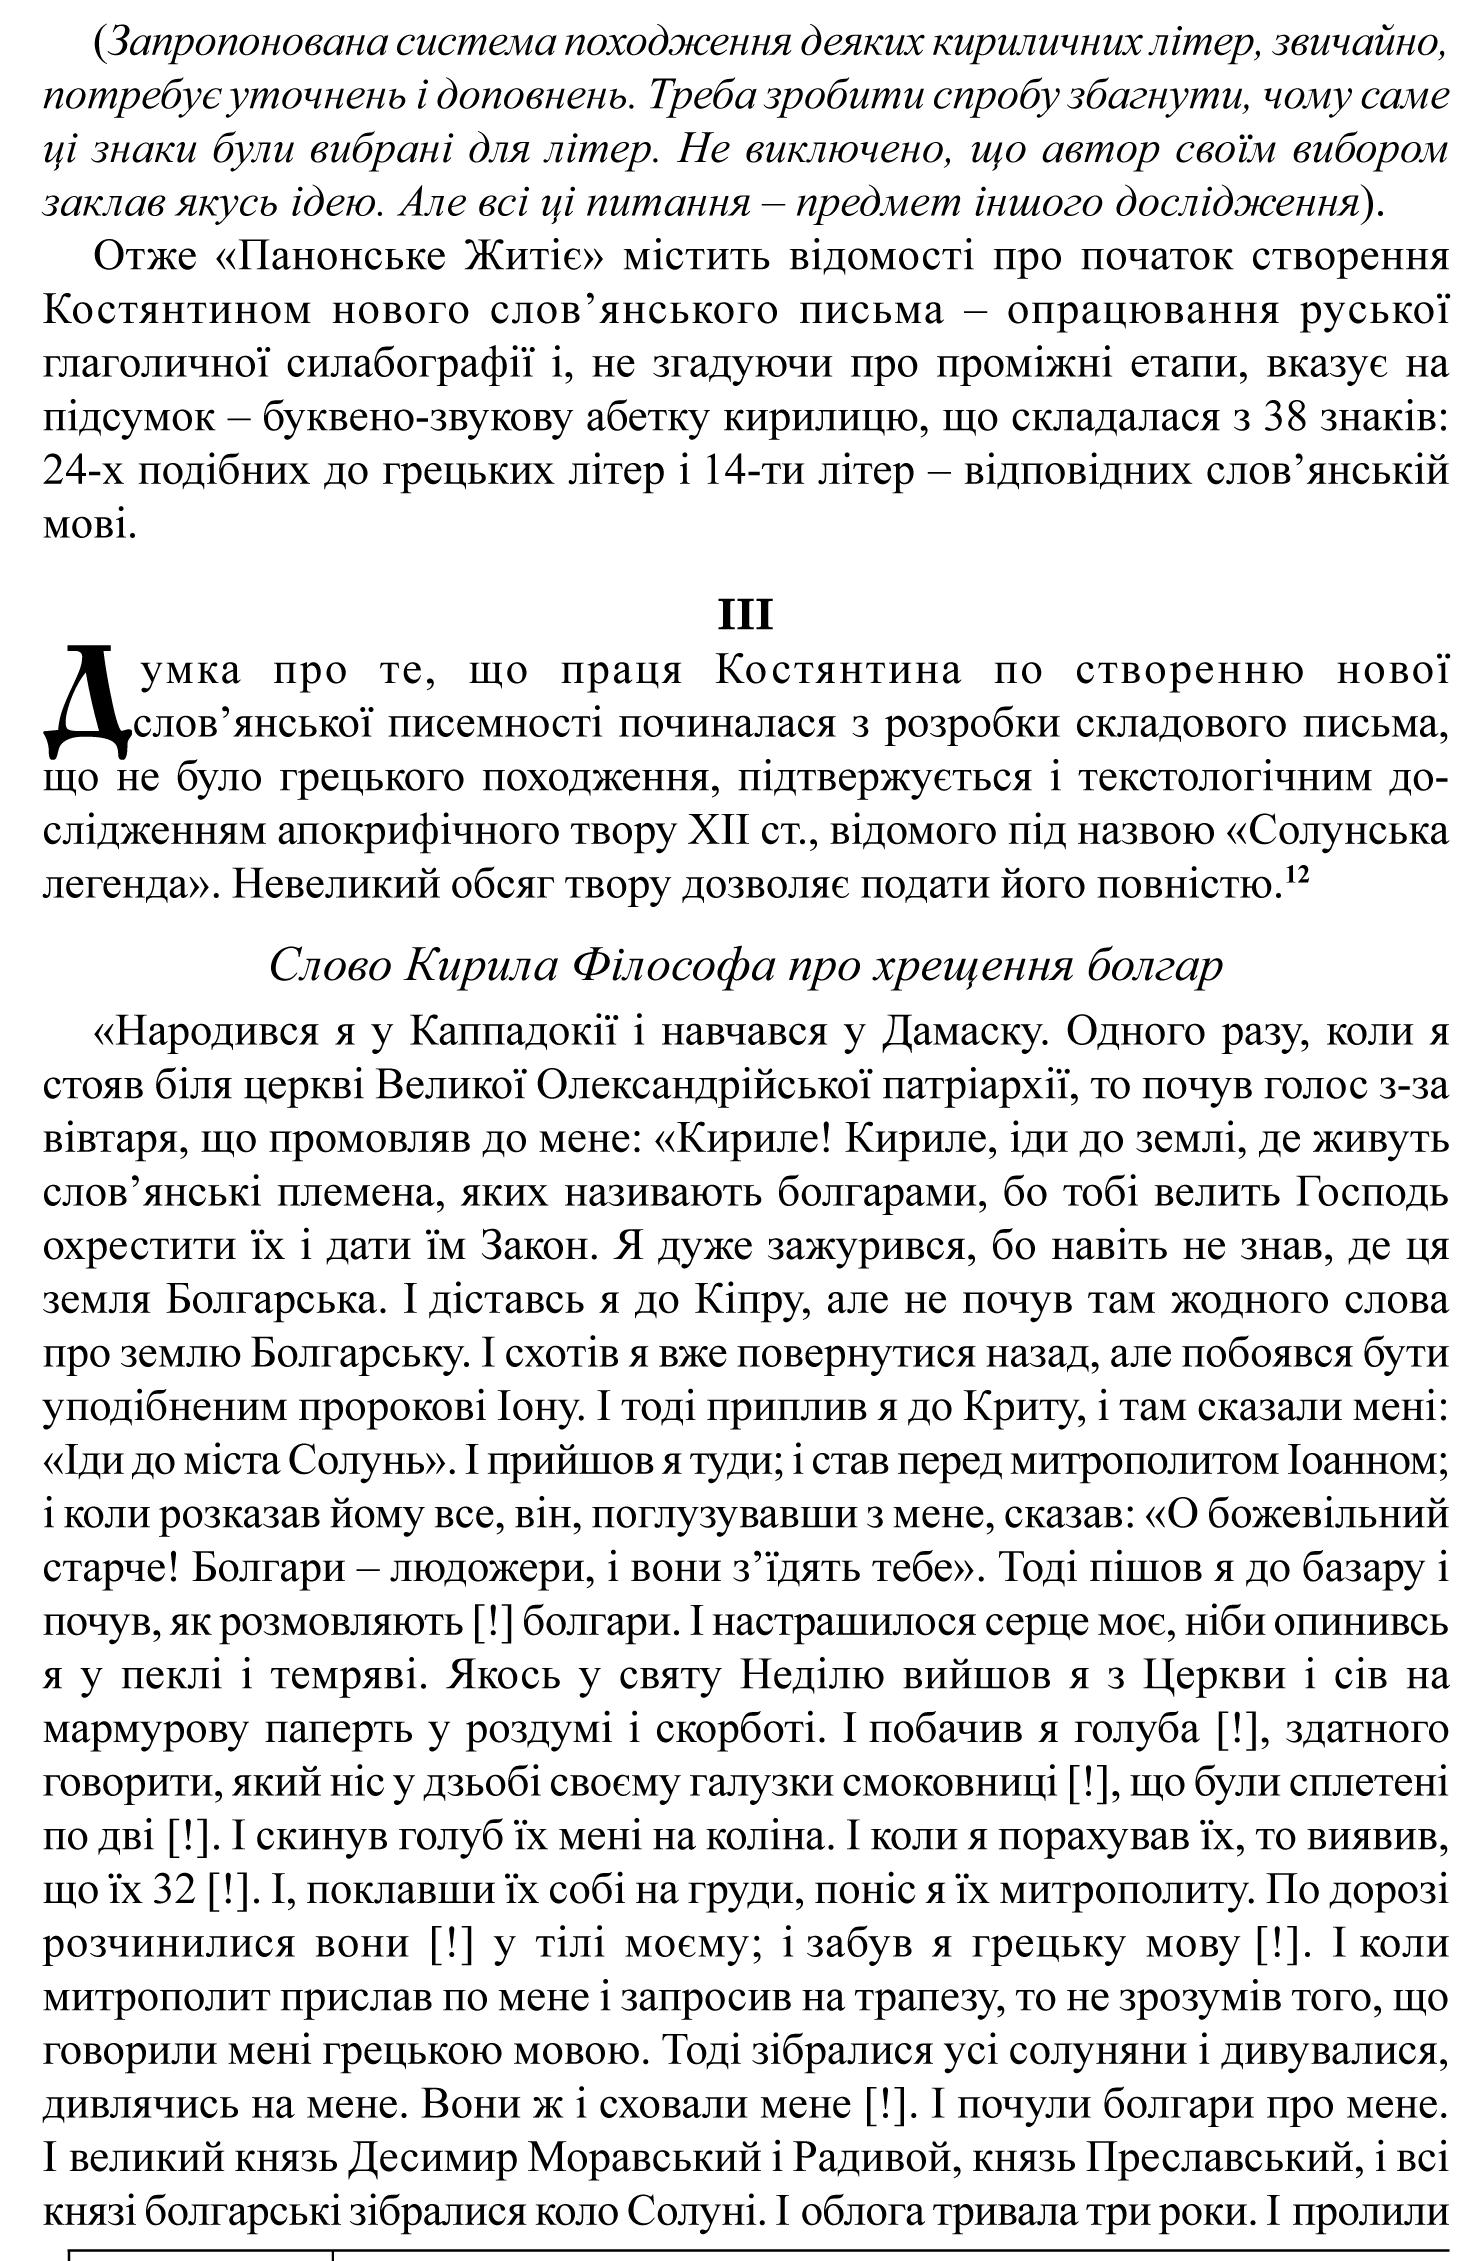 Докирил письмо-6.png